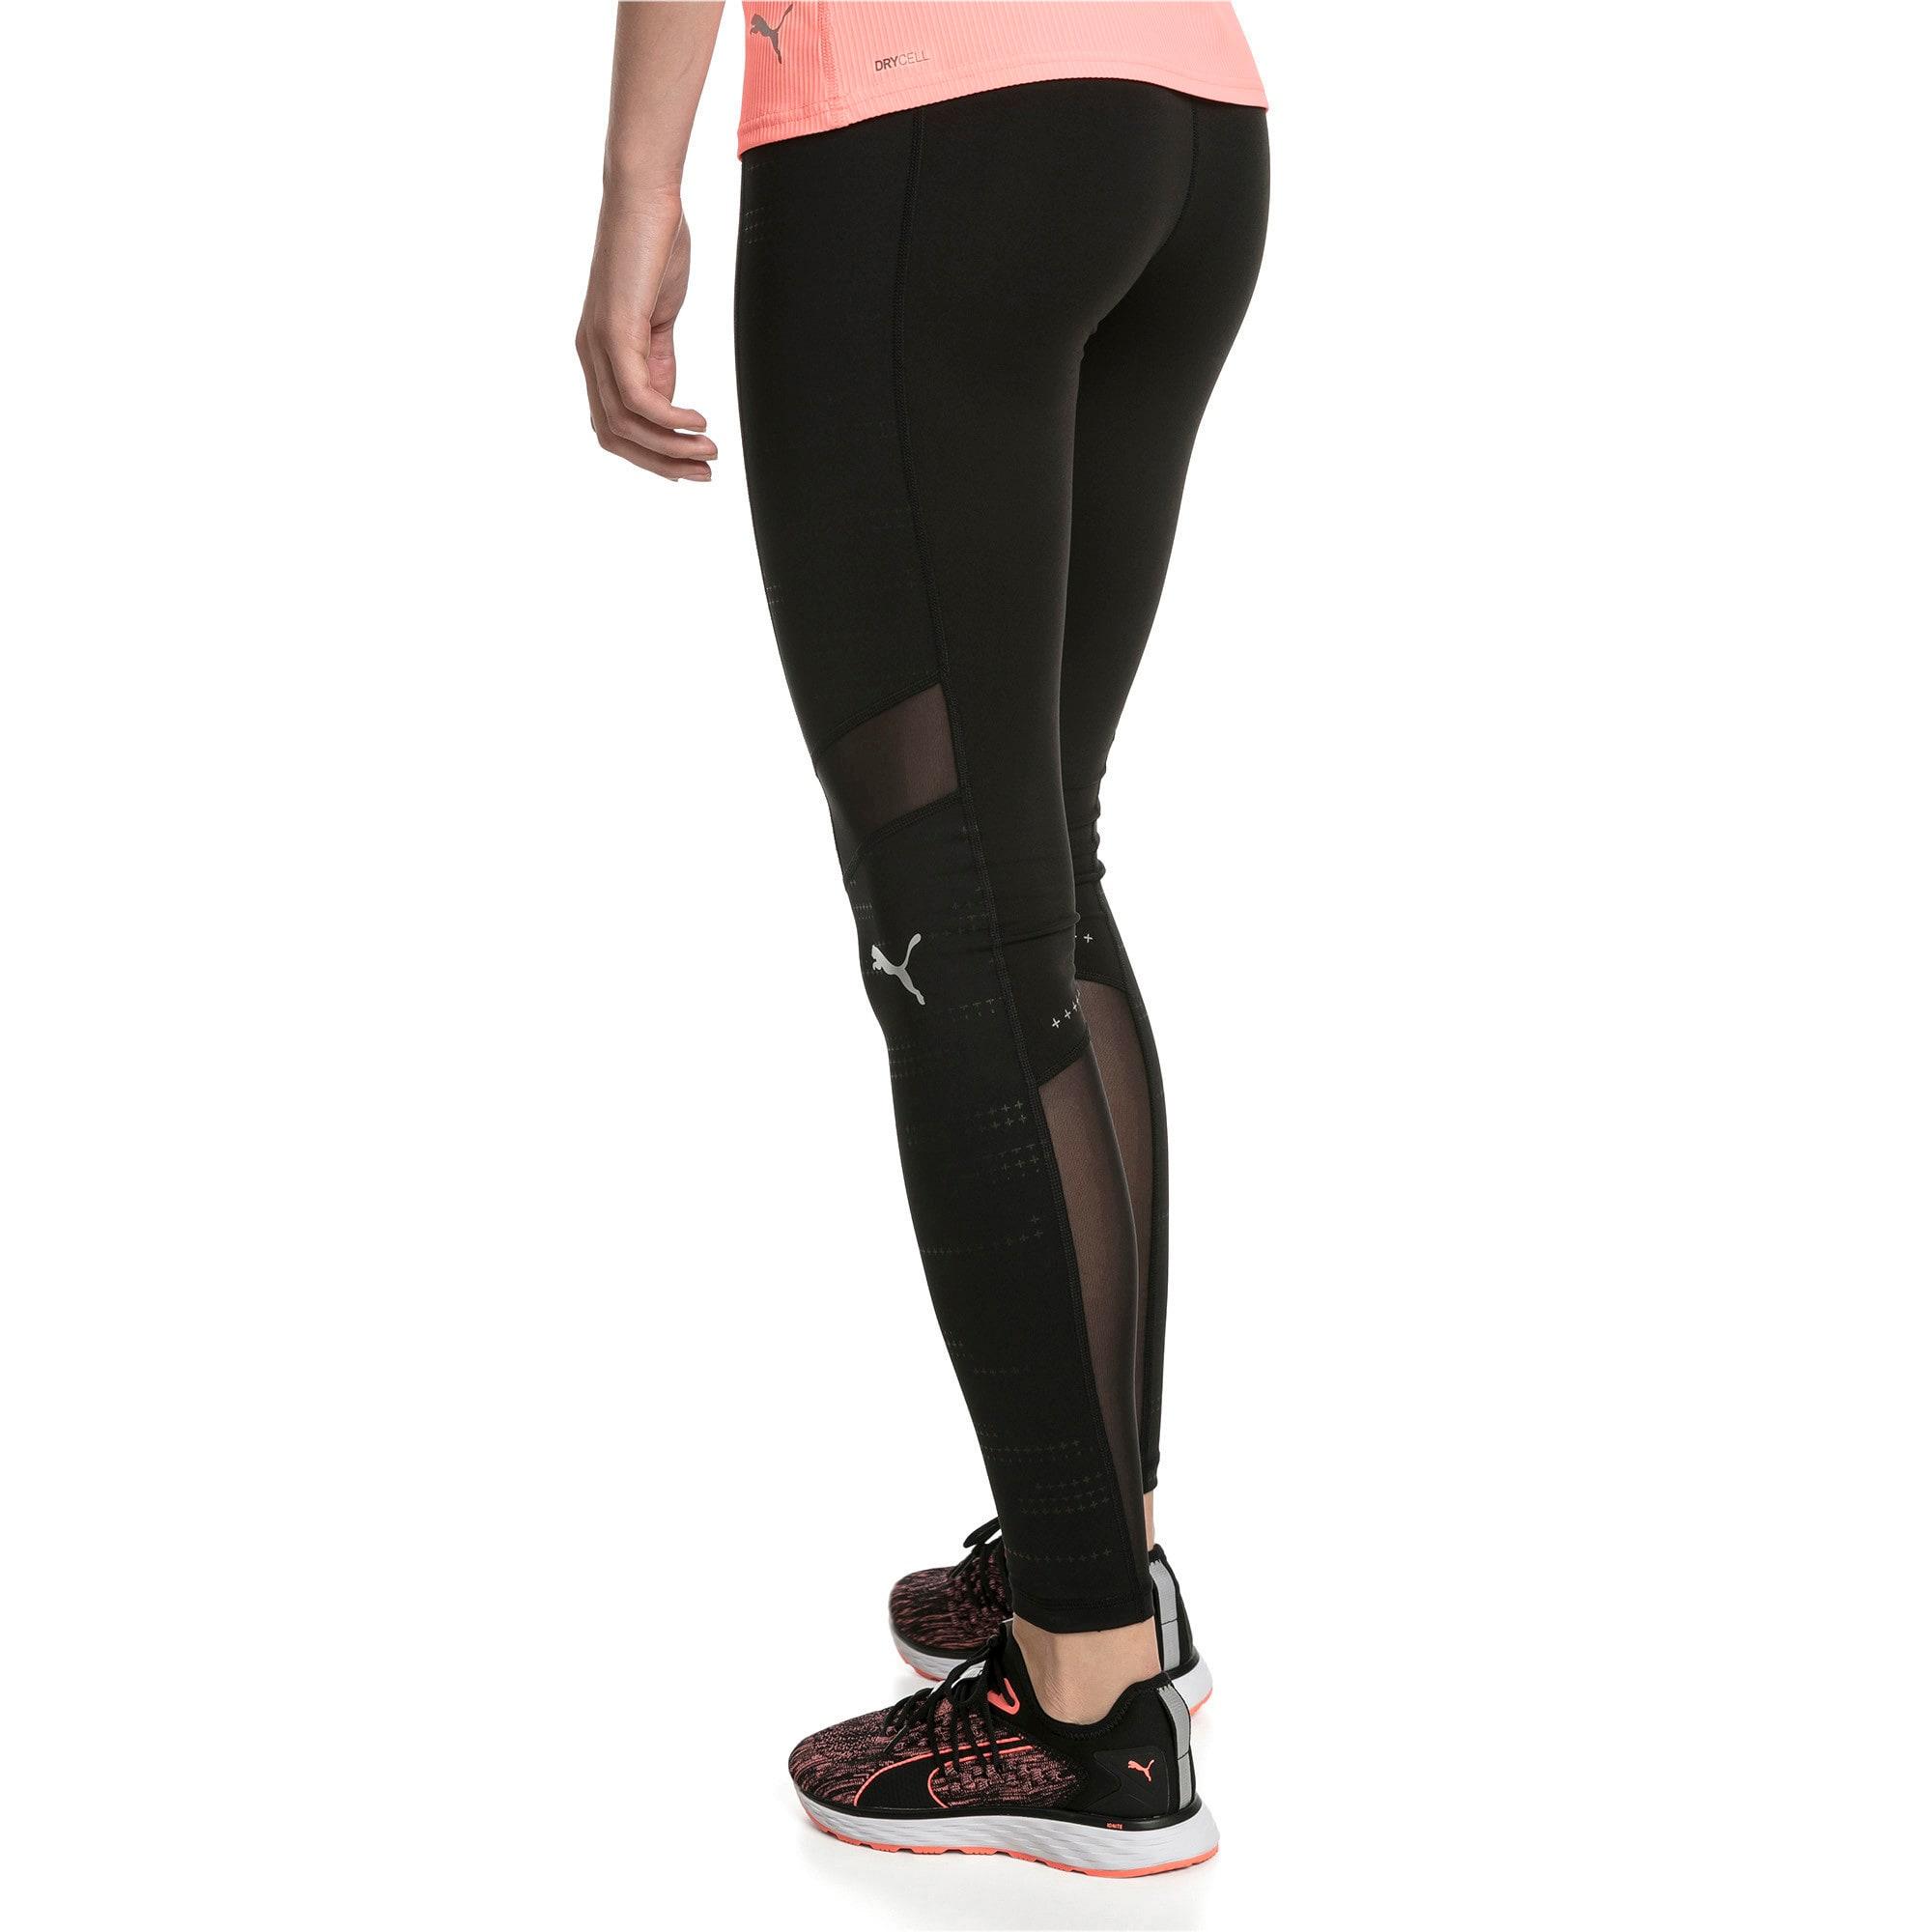 Thumbnail 2 of Ignite Women's Running Leggings, Puma Black, medium-IND